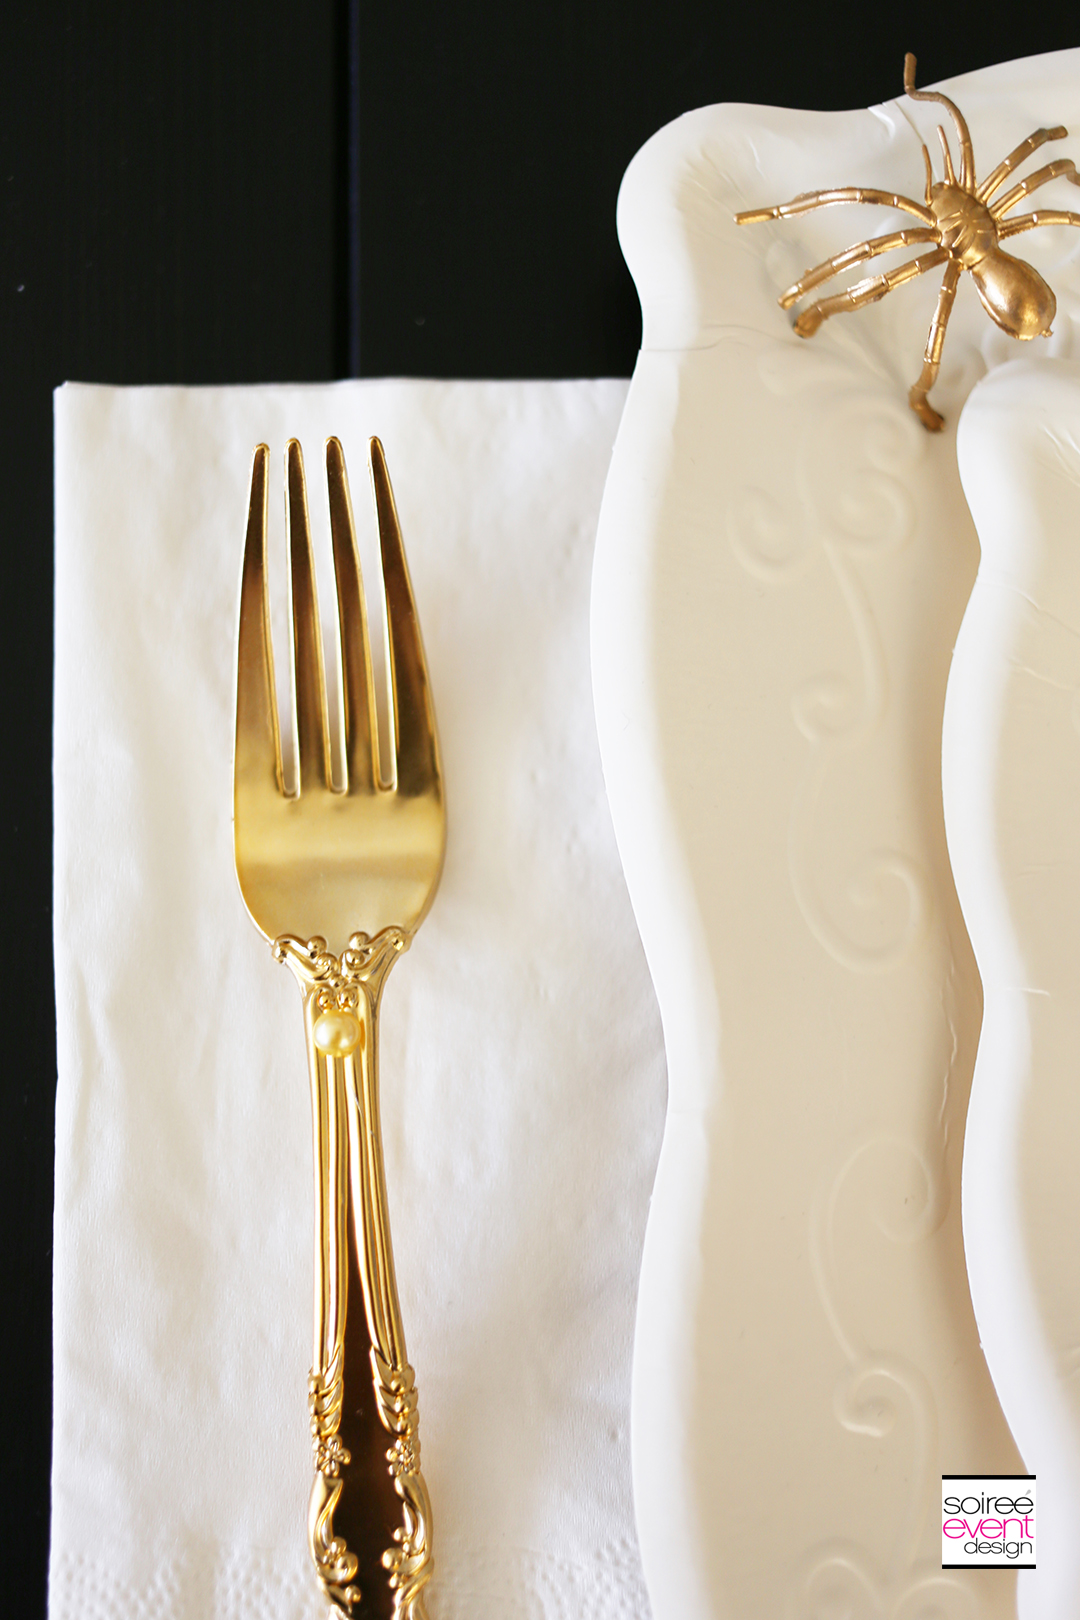 gold-cutlery